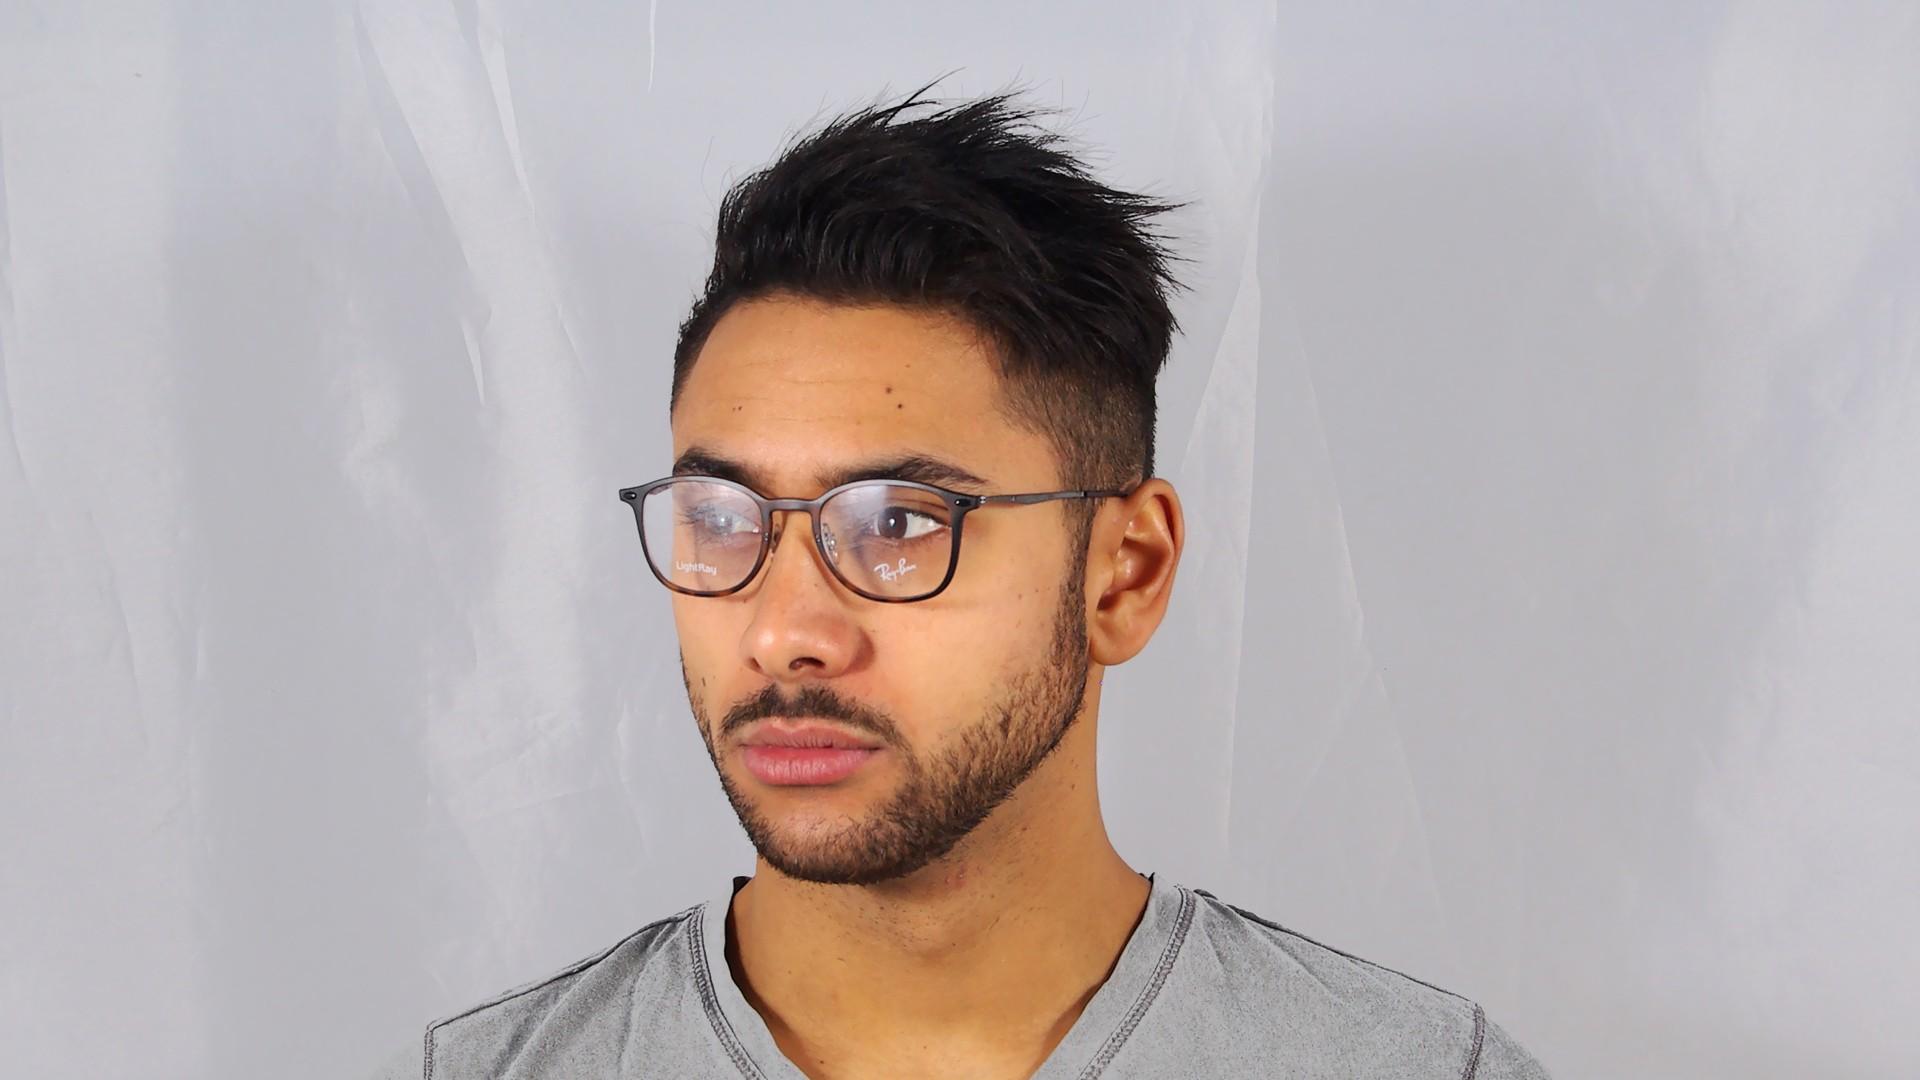 Ray-Ban Light Ray RX7051 RB7051 5200 47-20 Tortoise ... Giorgio Armani Eyeglasses